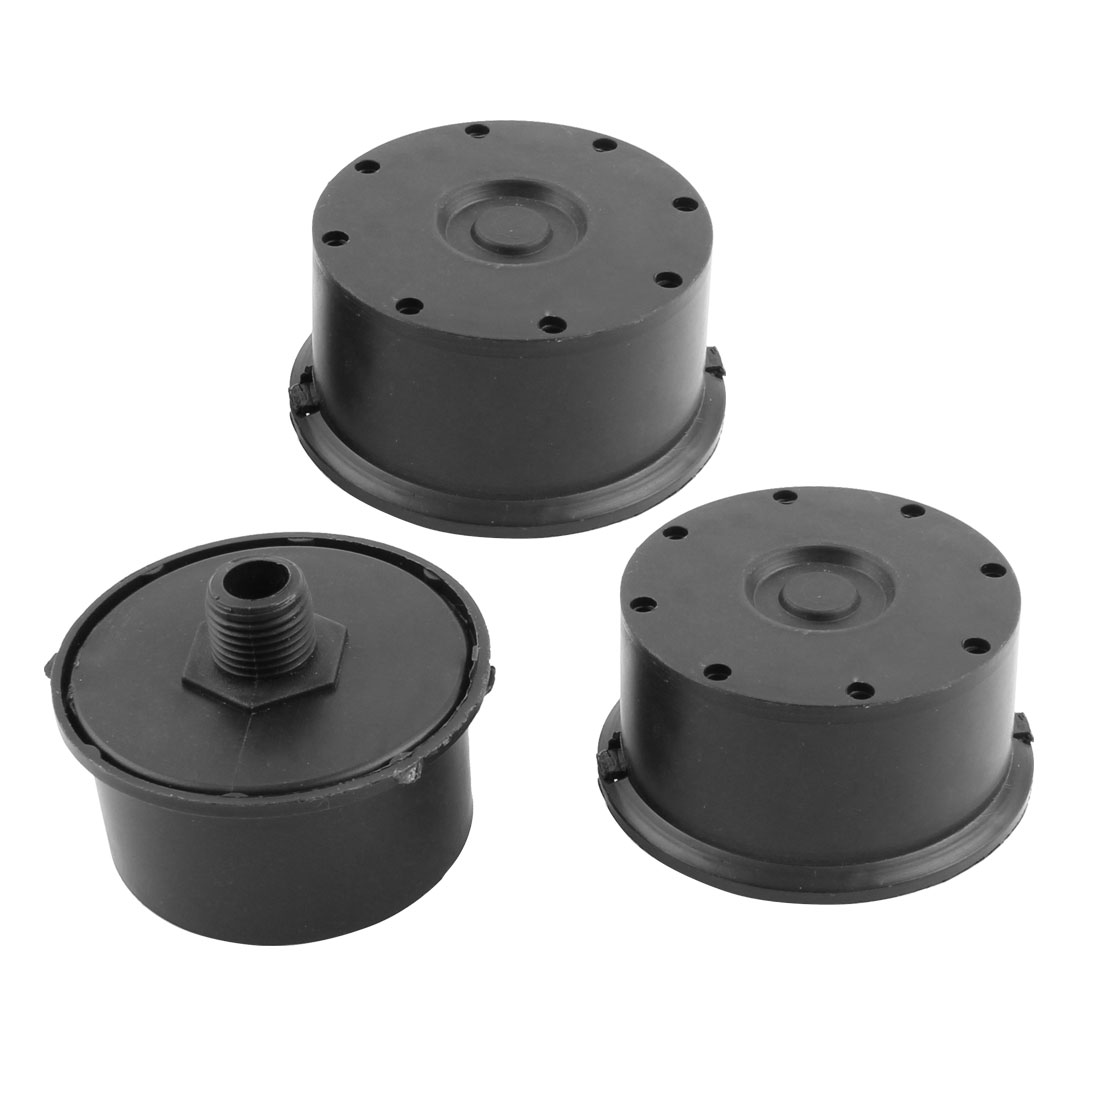 3/8BSP 16mm Thread Diameter Black Admitting Port Air Compressor Intake Filter Silencer Muffler 3pcs